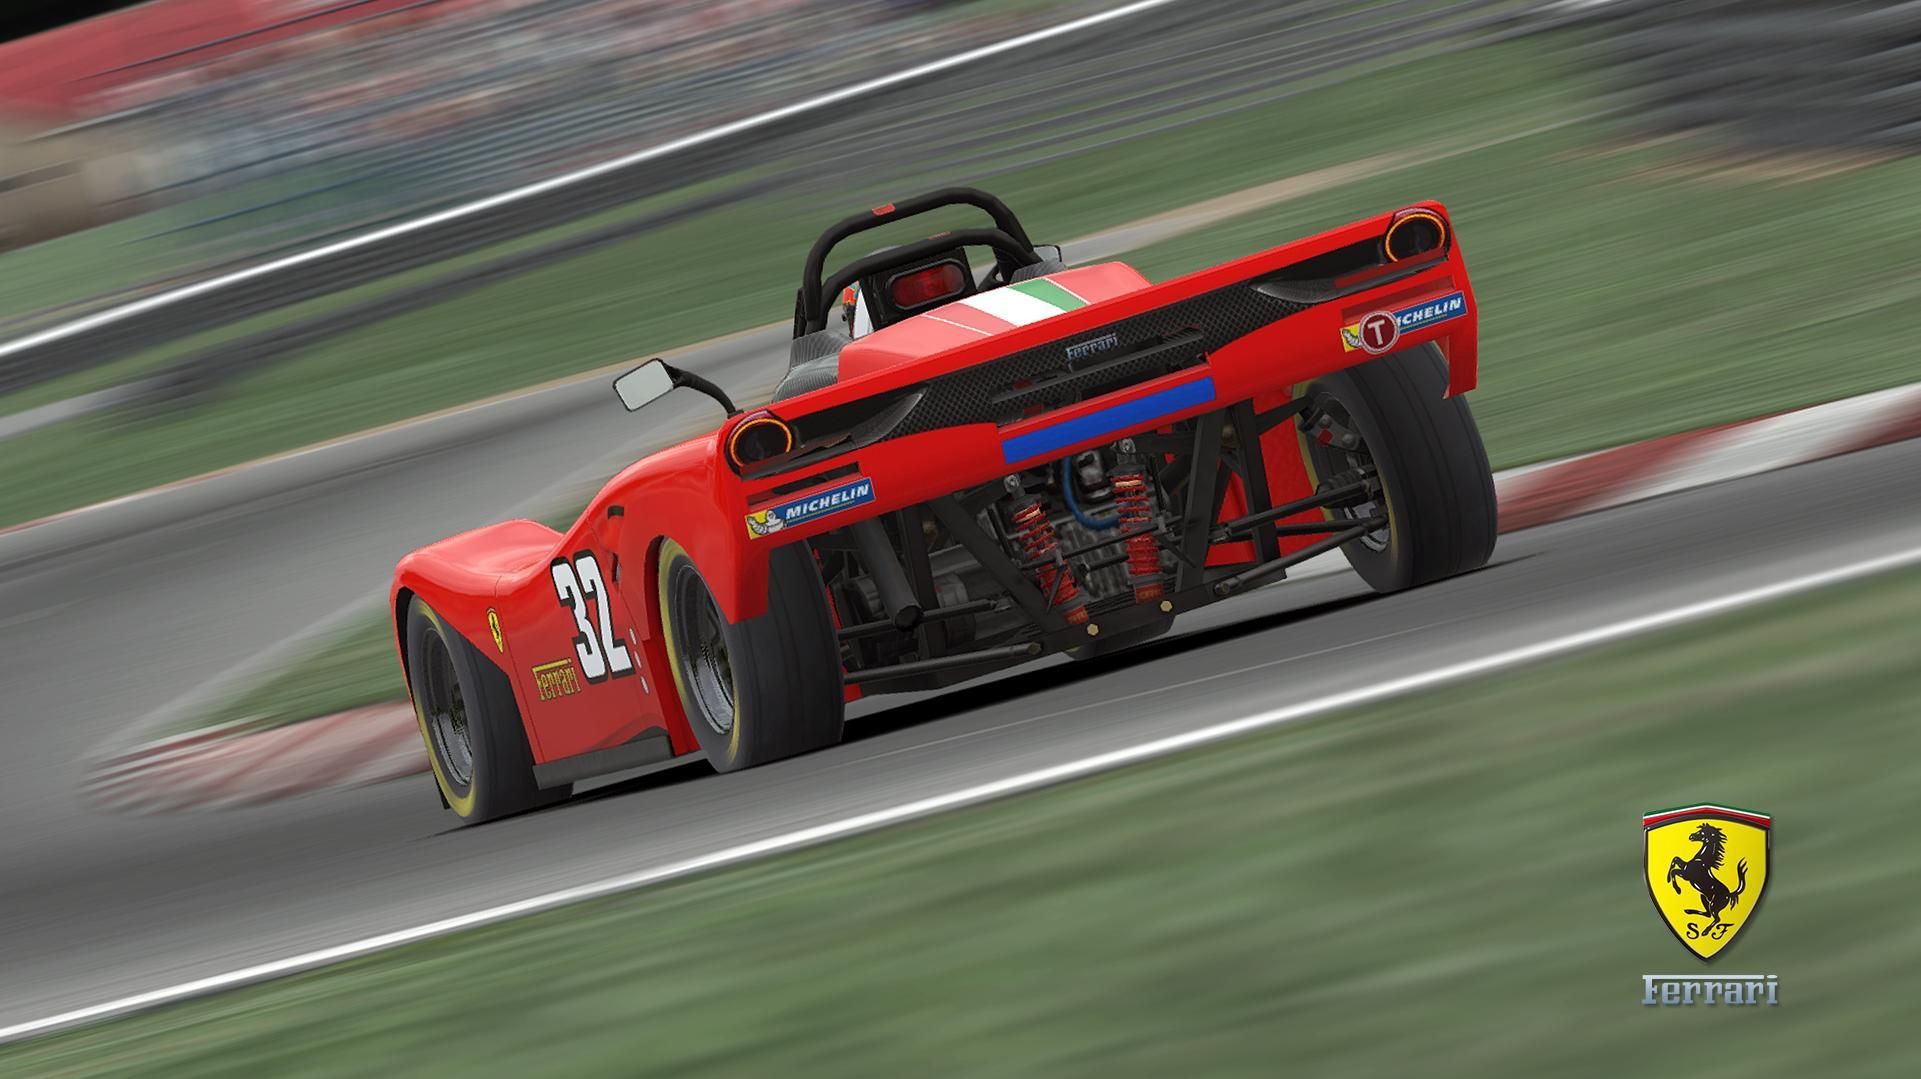 Preview of Spec Racer Ferrari (Fictional) by Justin S Davis